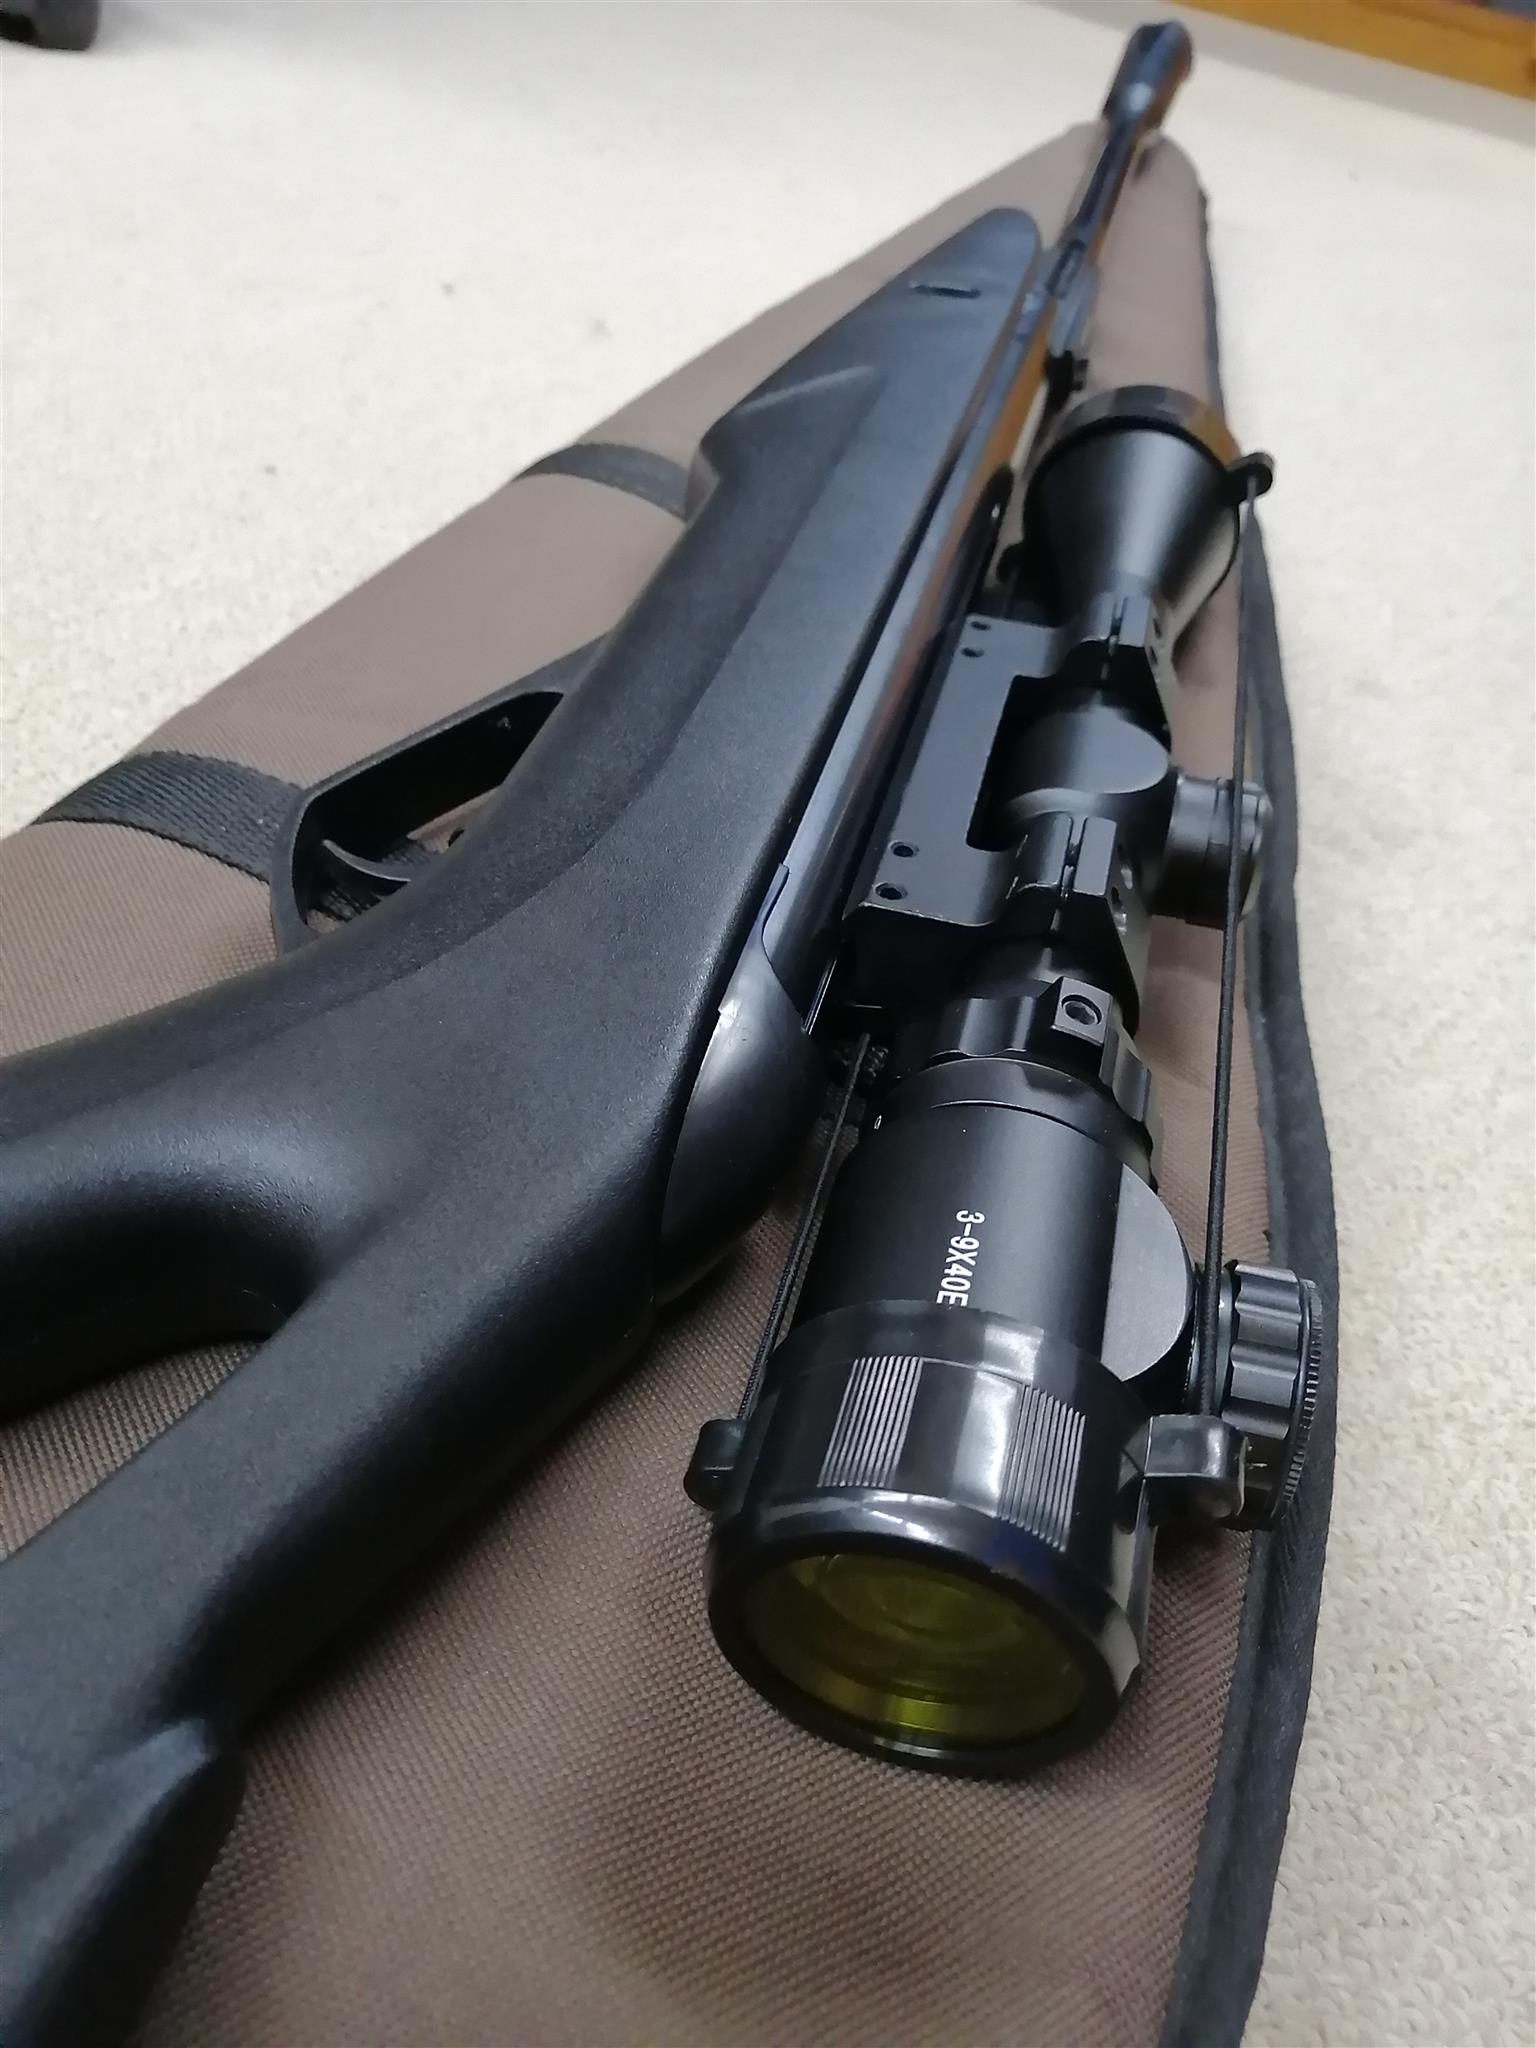 Gamo Whisper Vampire X air rifle with precision 3-9x40 scope and upgrade piston